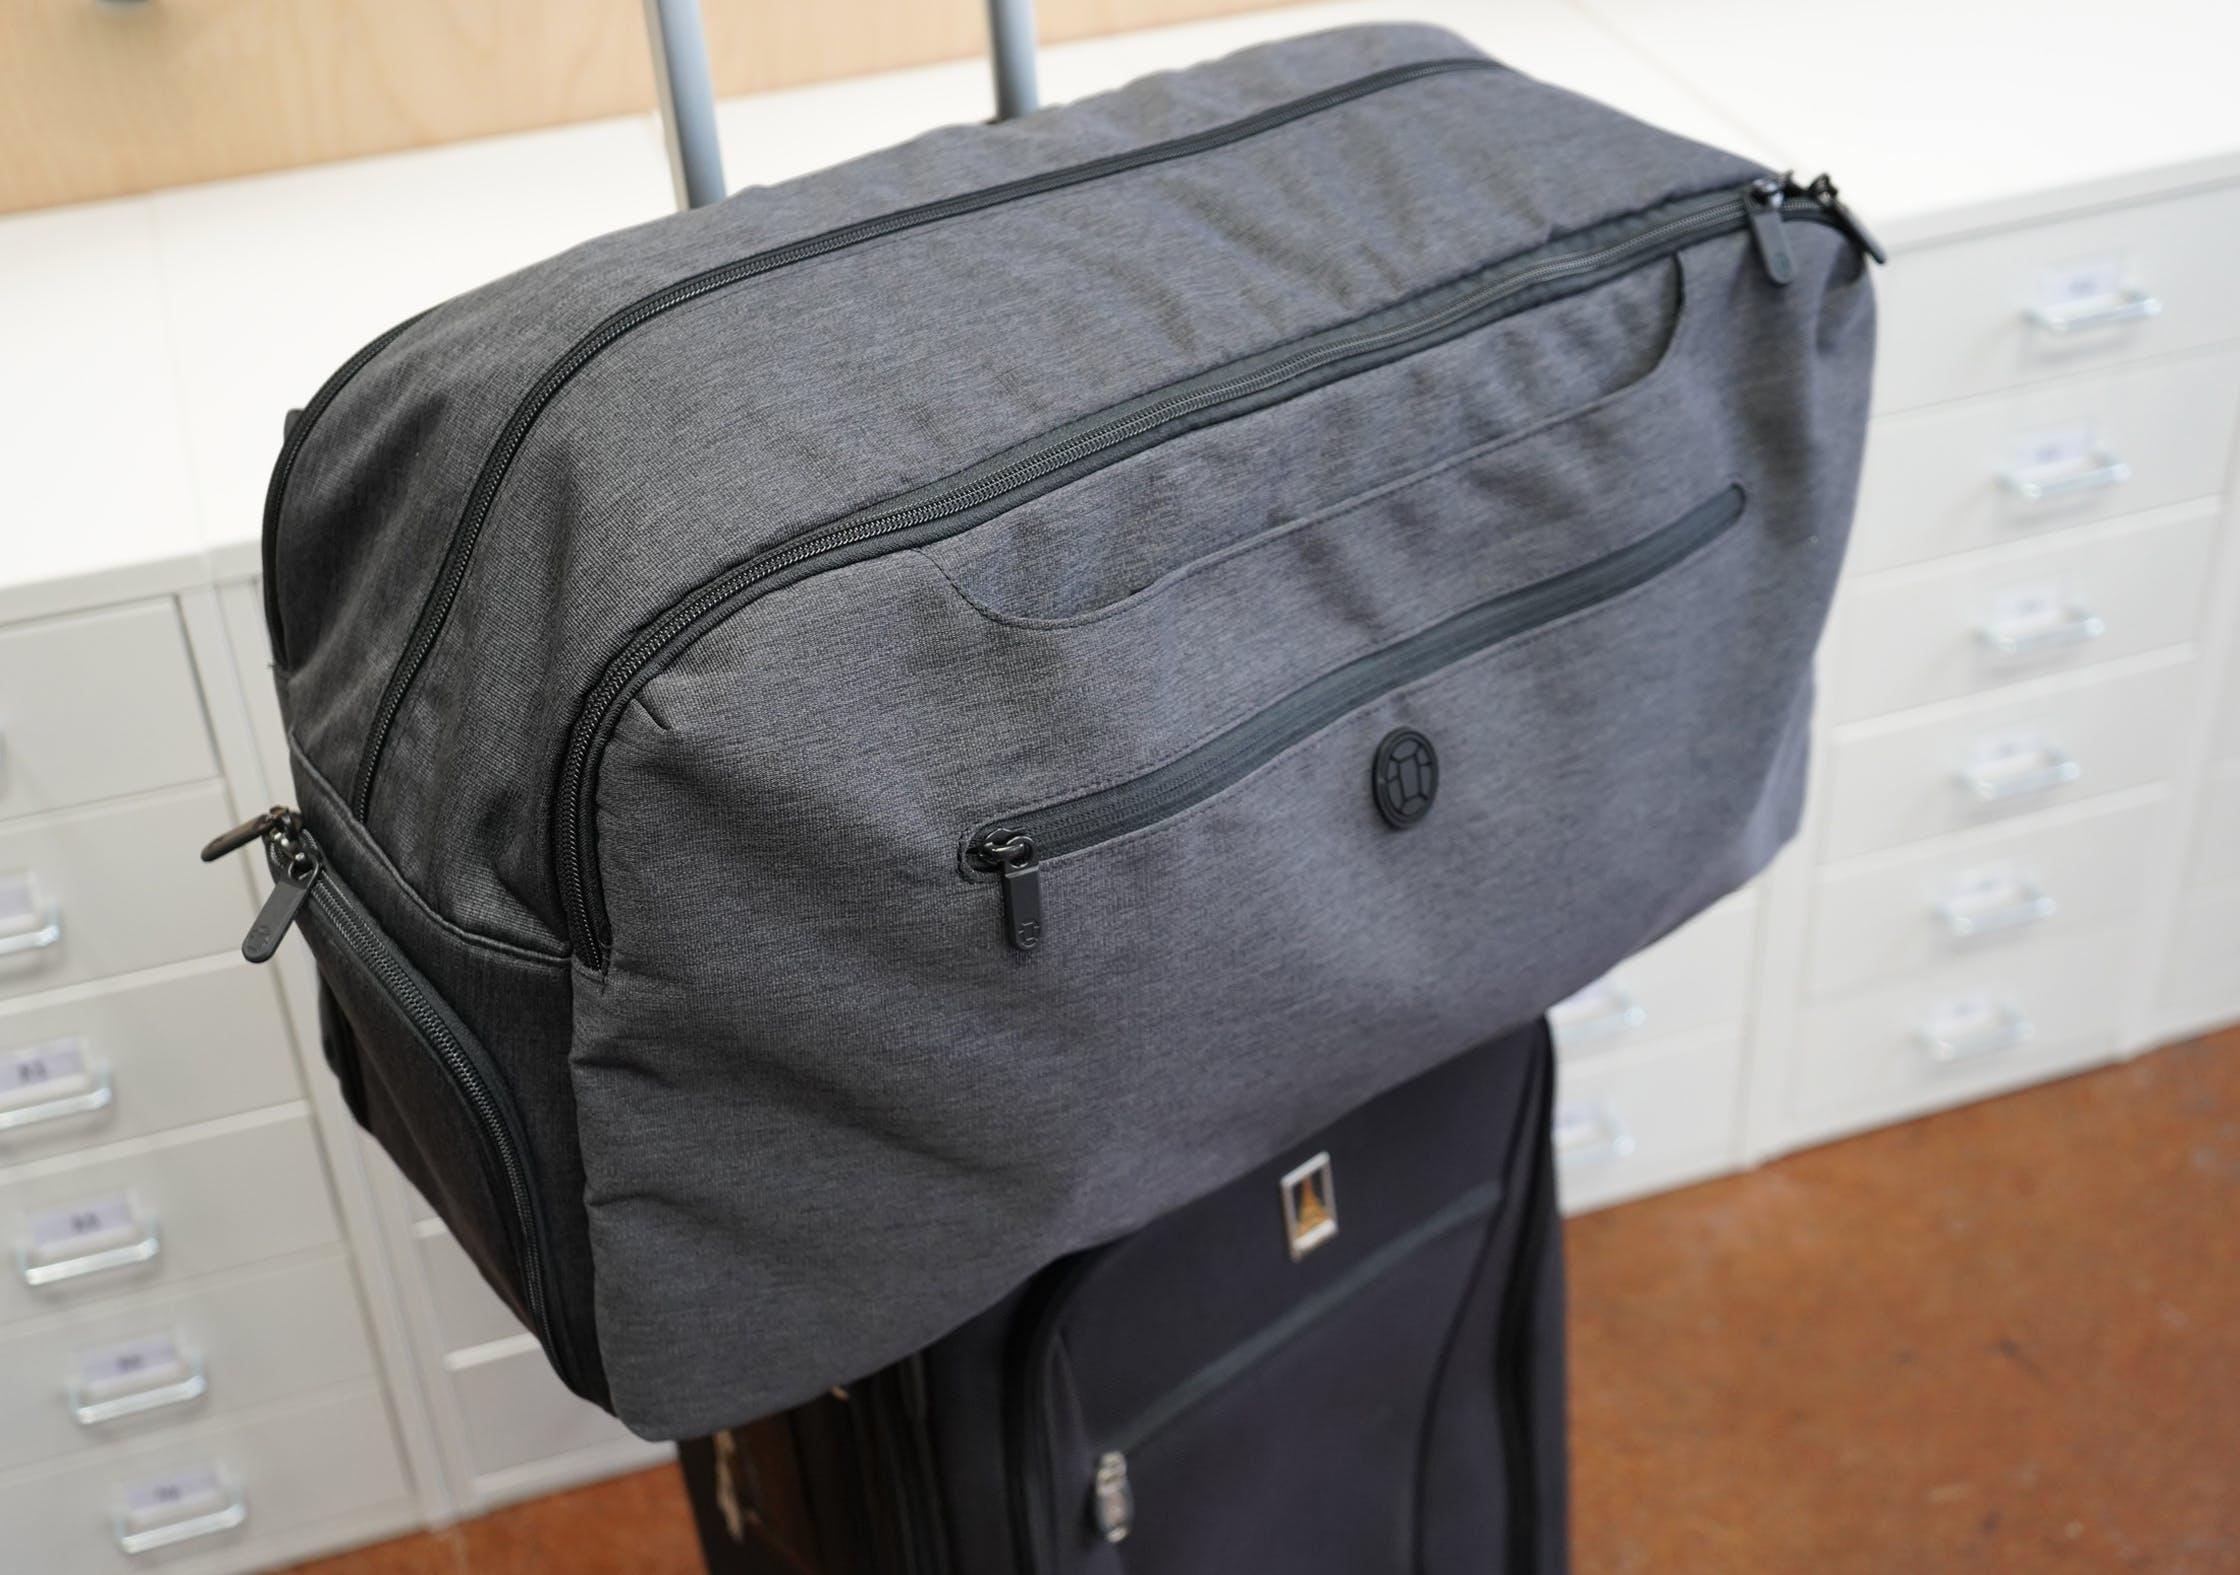 Tortuga Setout Duffle With Luggage